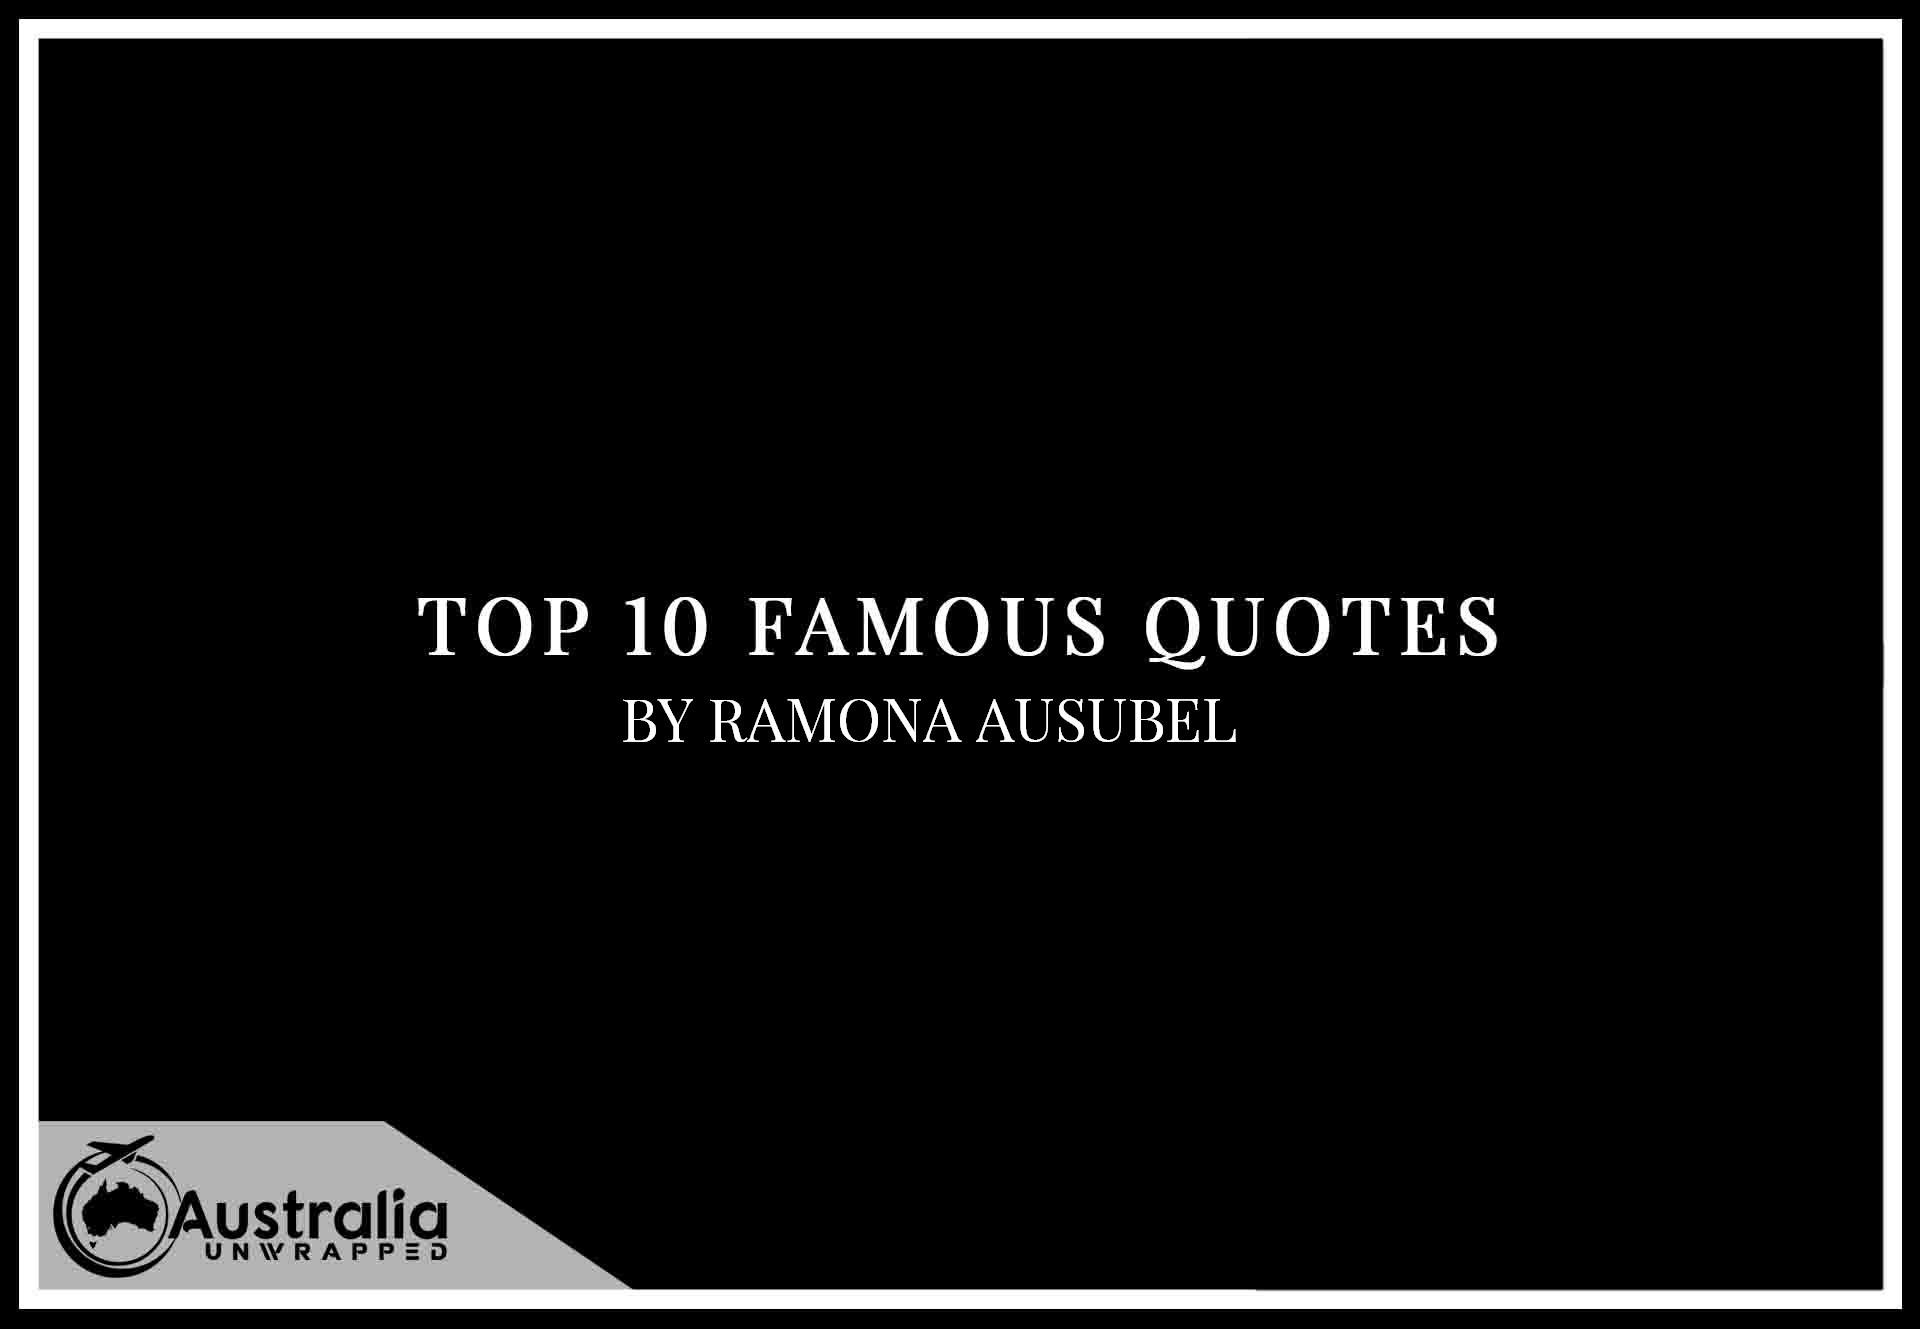 Top 10 Famous Quotes by Author Ramona Ausubel